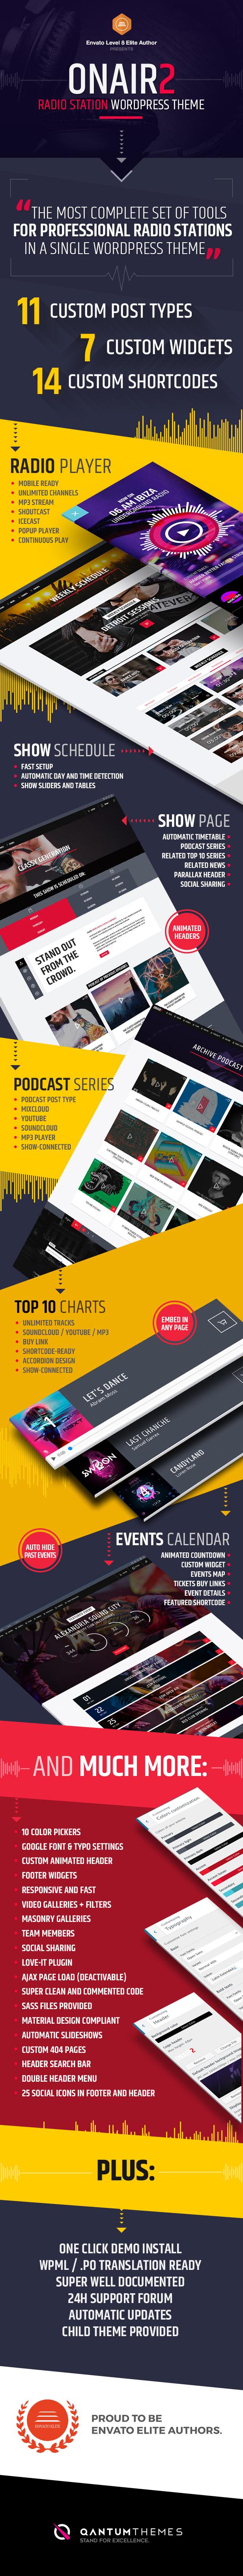 infographic - Onair2: Radio Station WordPress Theme With Non-Stop Music Player